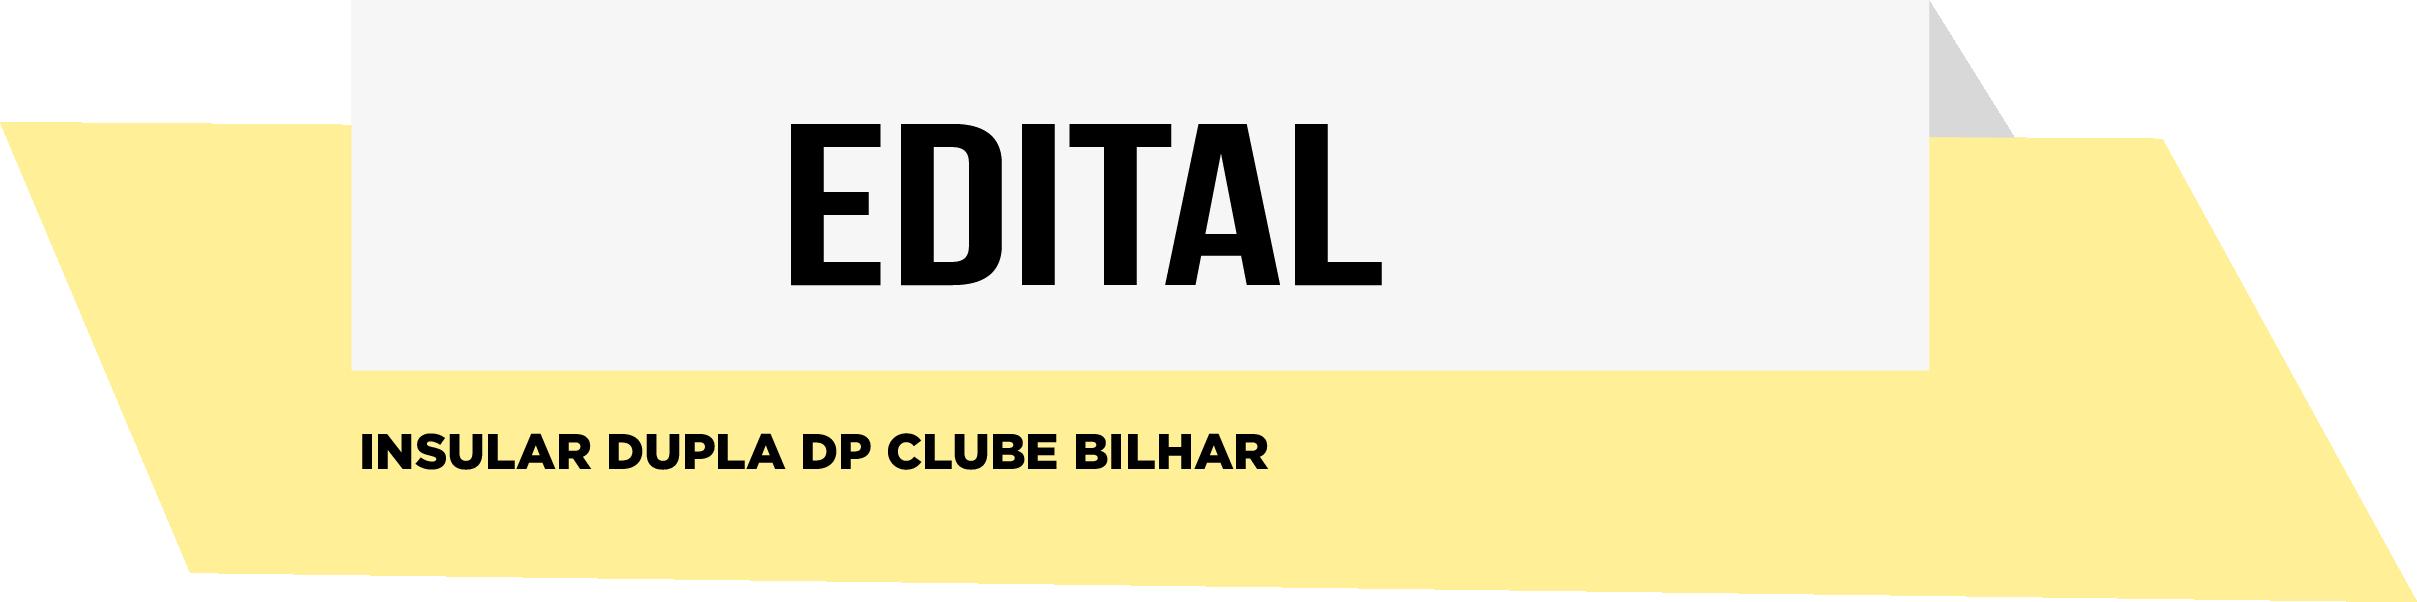 EDITAL- Insular Dupla DP Clube Bilhar